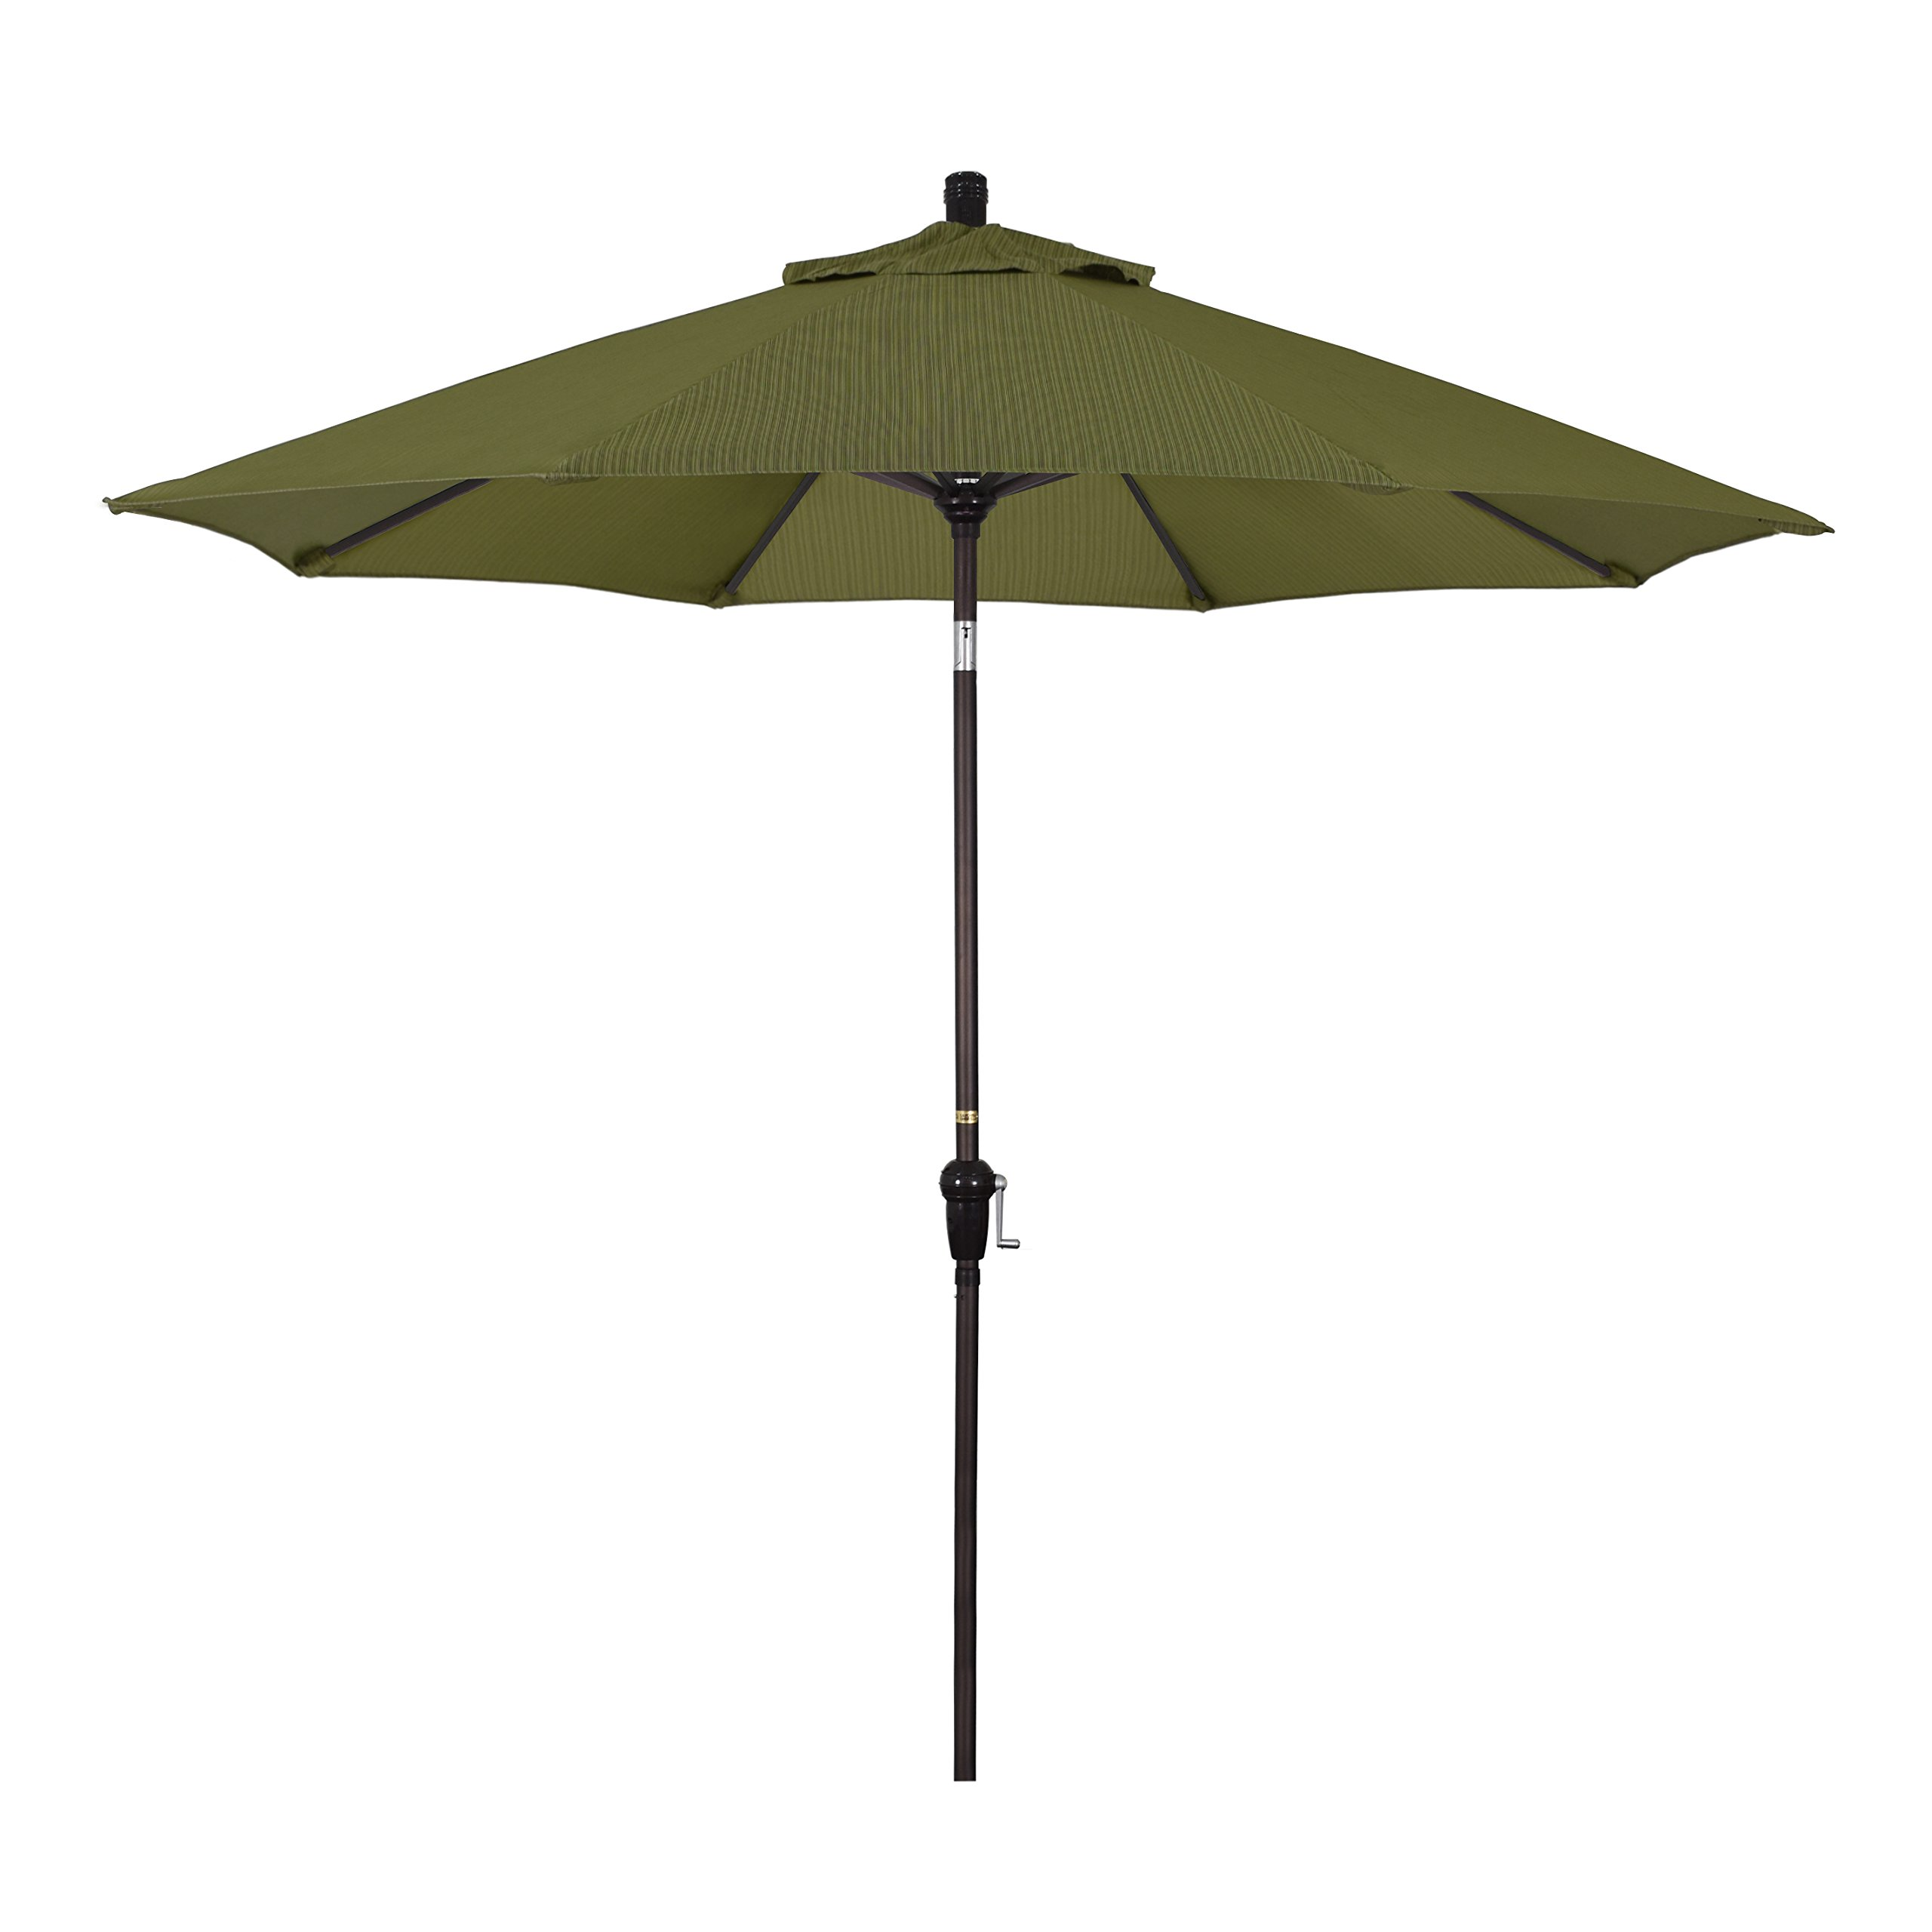 California Umbrella 9' Round Aluminum Market Umbrella, Crank Lift, Auto Tilt, Bronze Pole, Fern